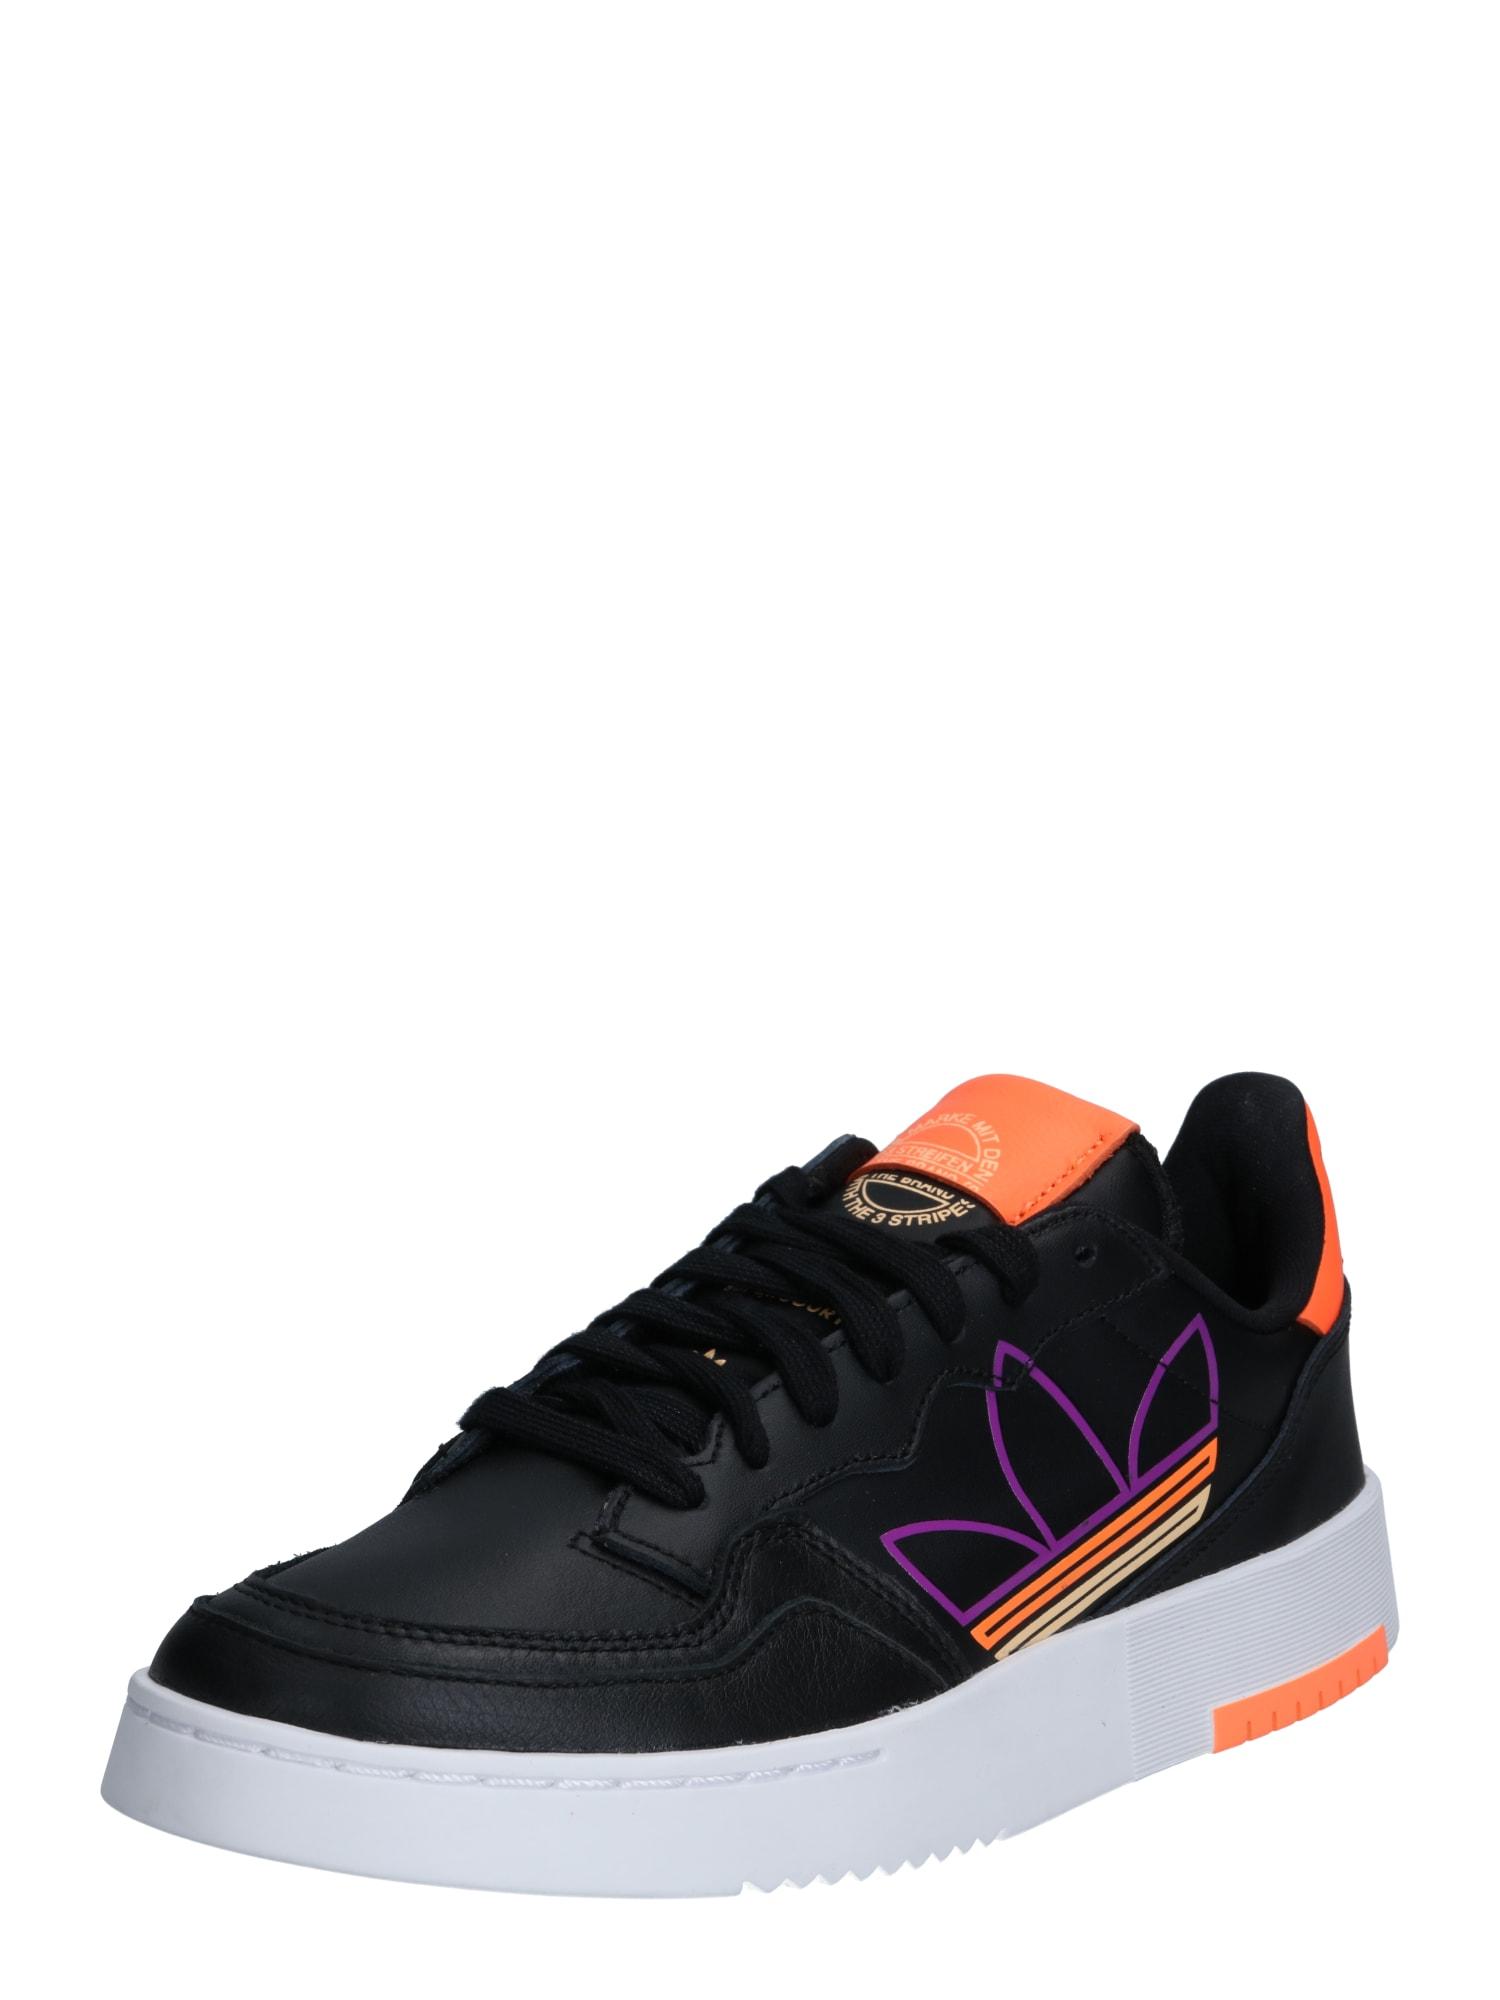 ADIDAS ORIGINALS Nízke tenisky 'SUPERCOURT'  čierna / oranžová / fialová